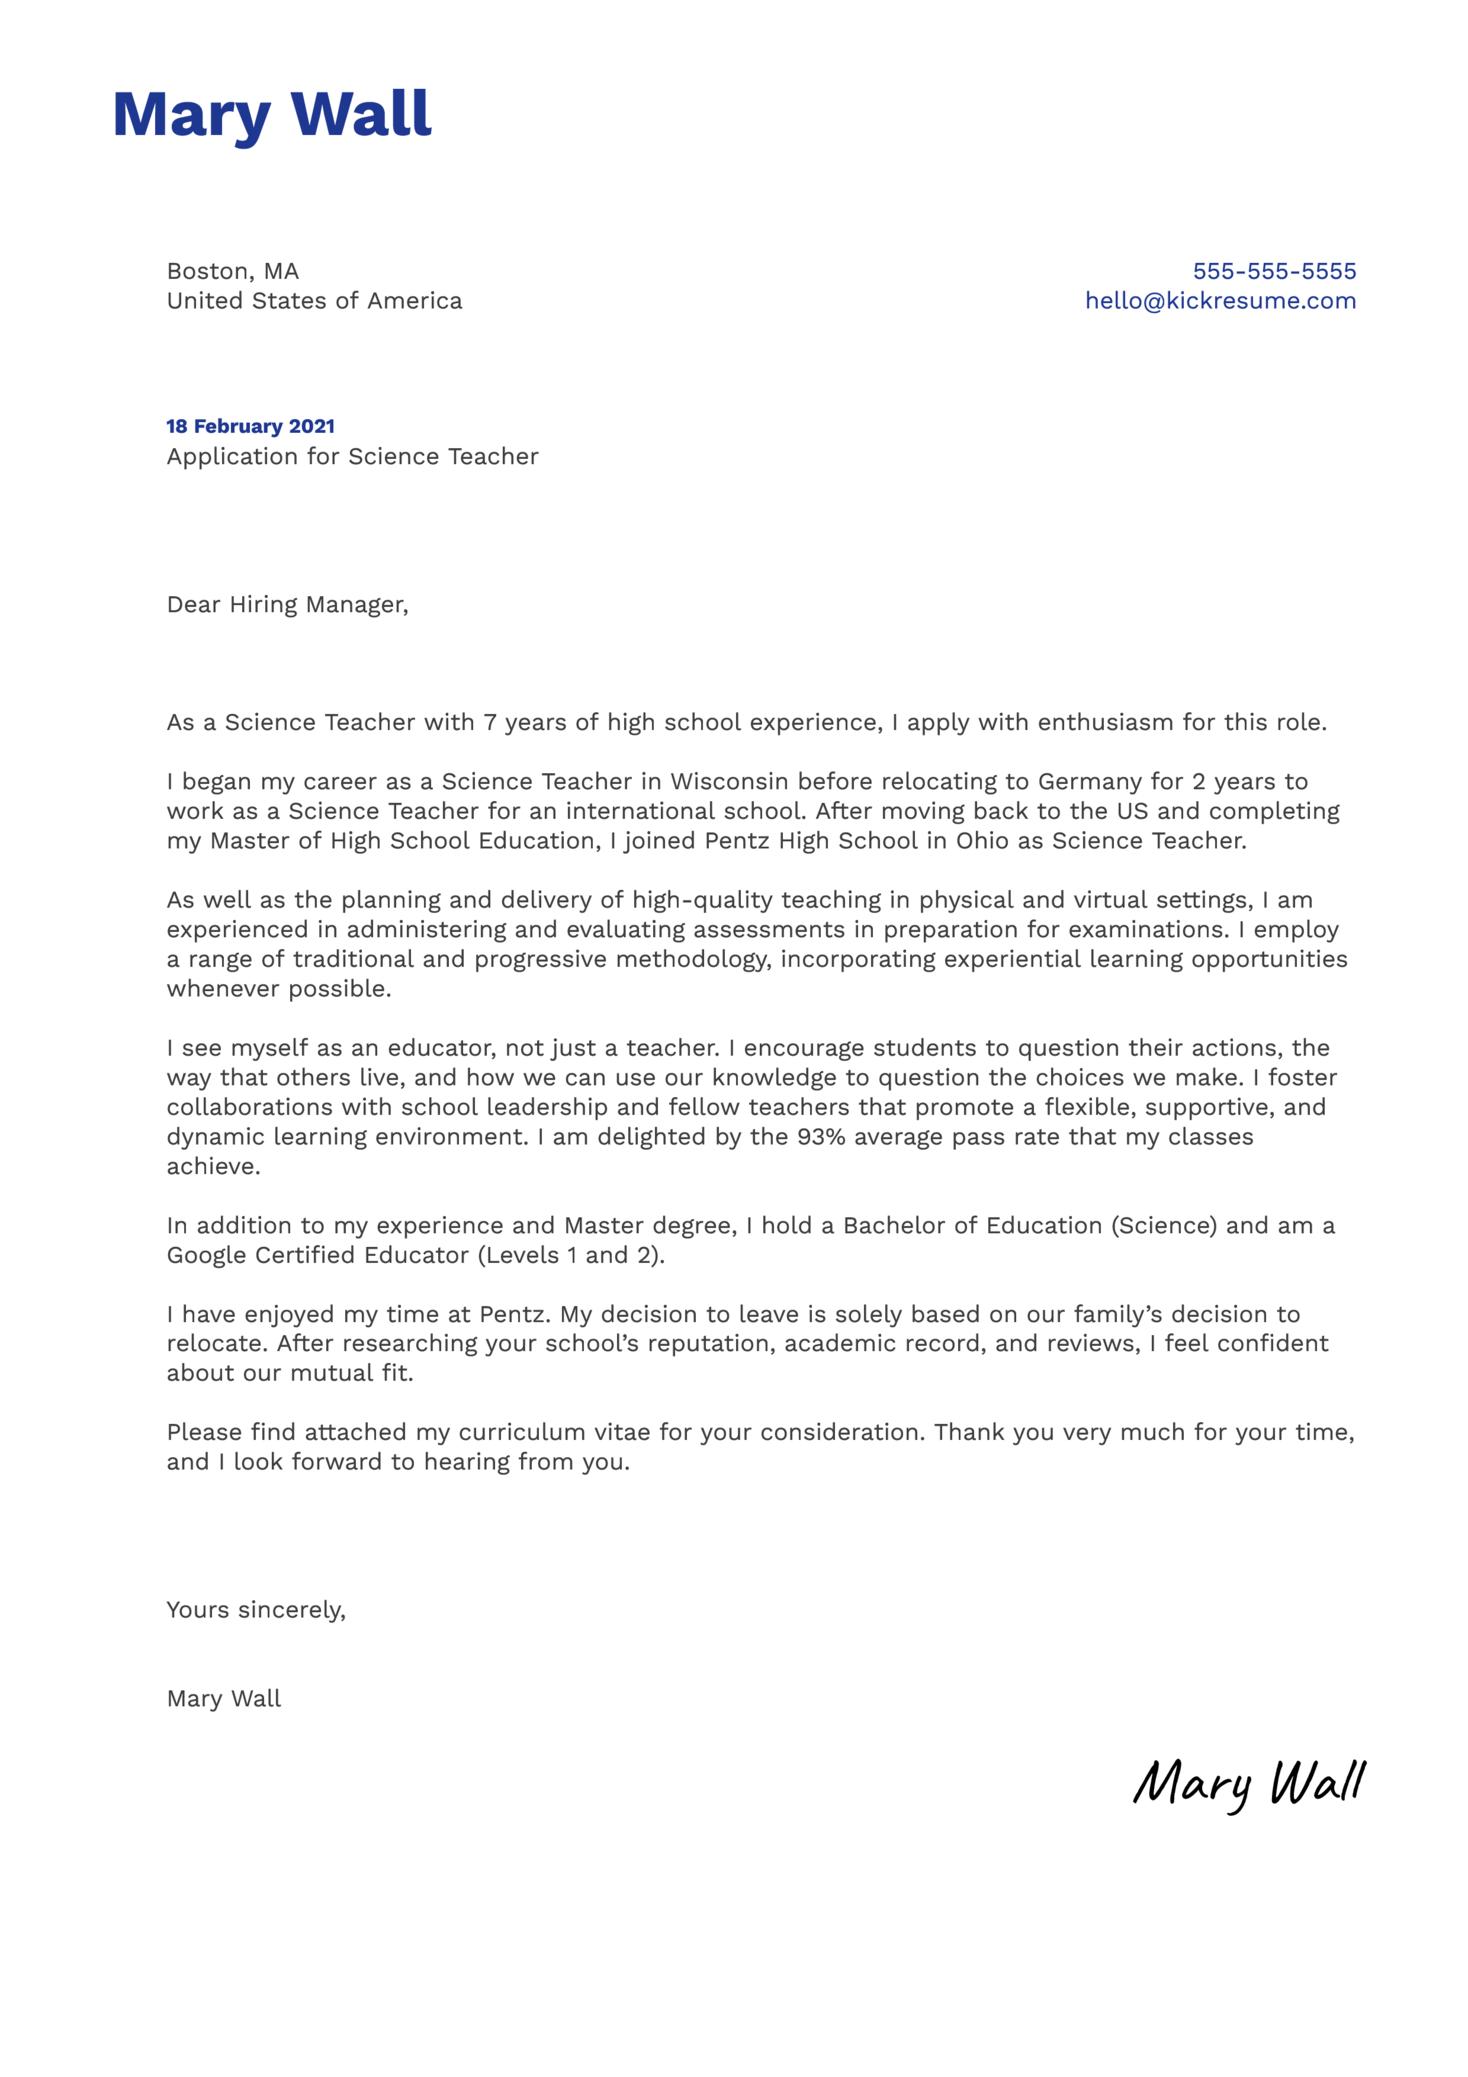 High School Science Teacher Cover Letter Template Kickresume